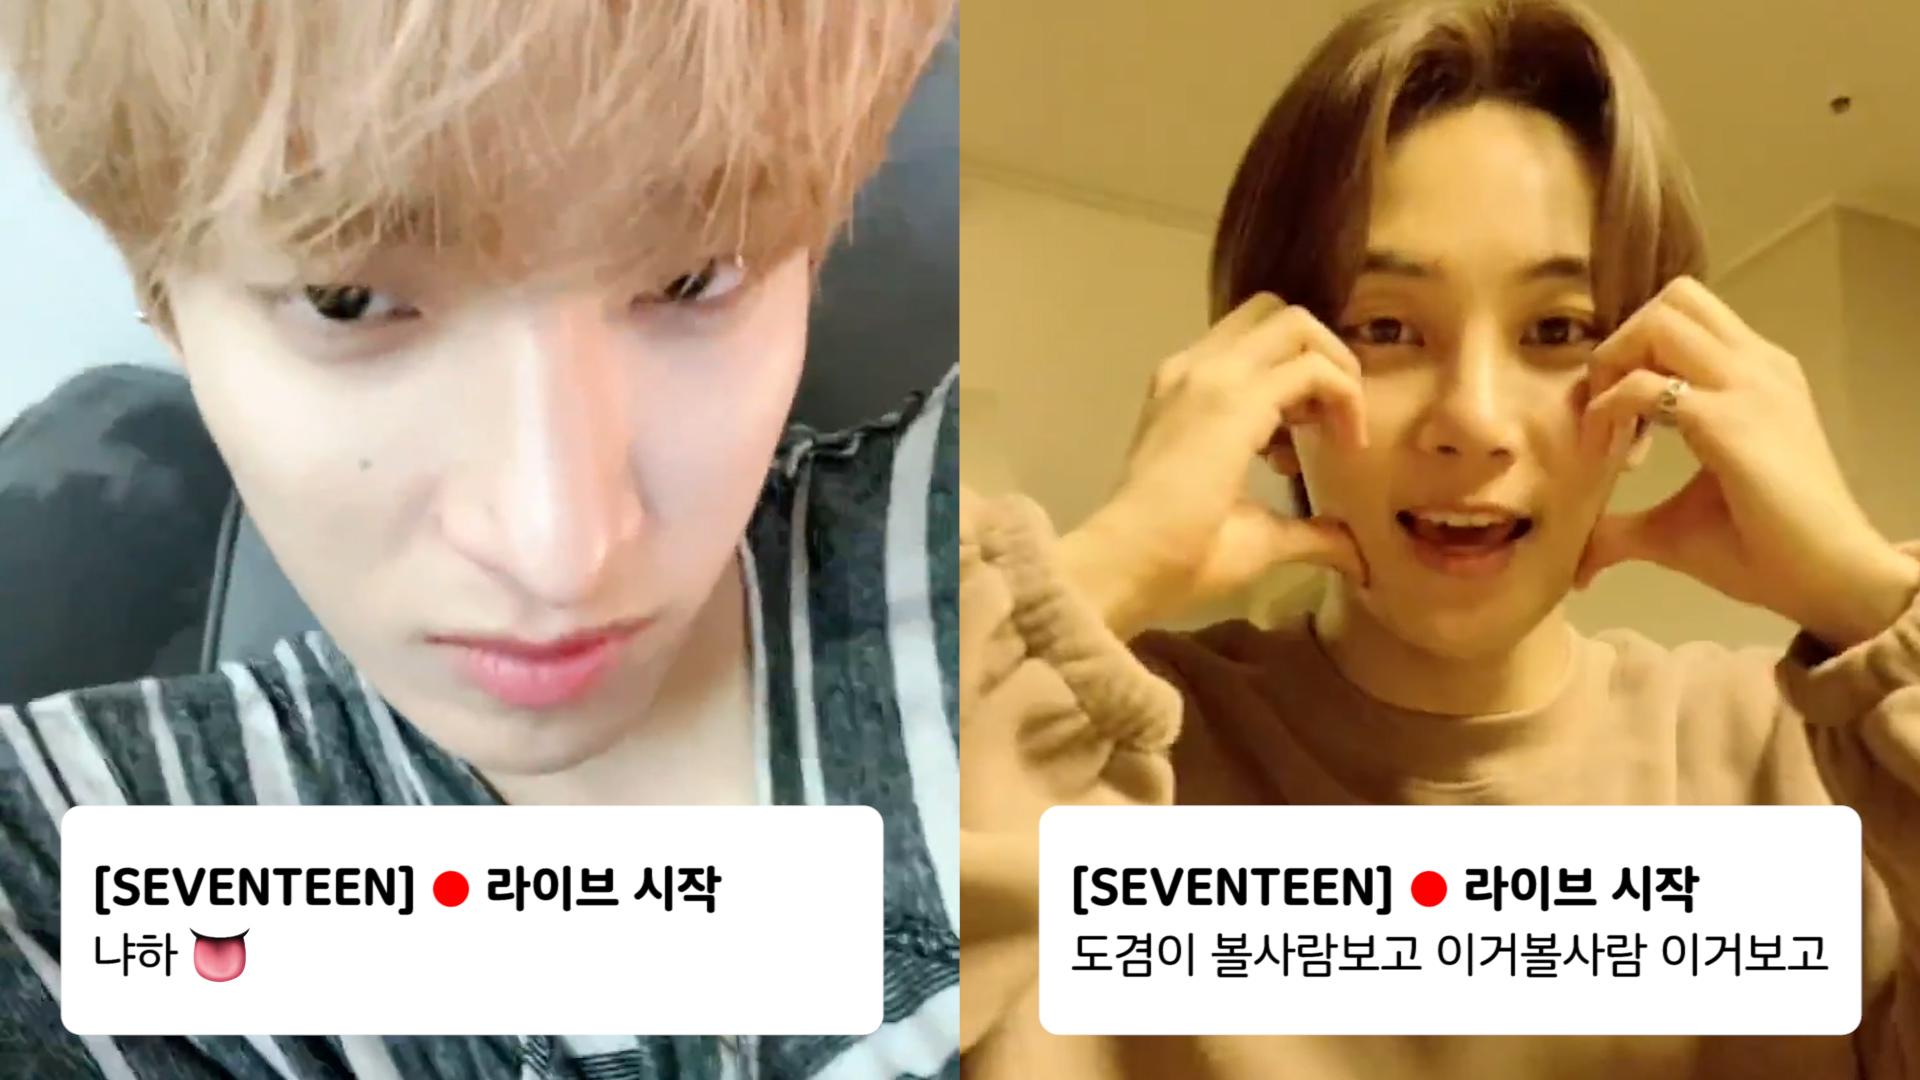 [SEVENTEEN] 세븐틴 더블브이앱 한 줄 요약 → 갑자기⁉️ (DK&Jeonghan's V at the same time)